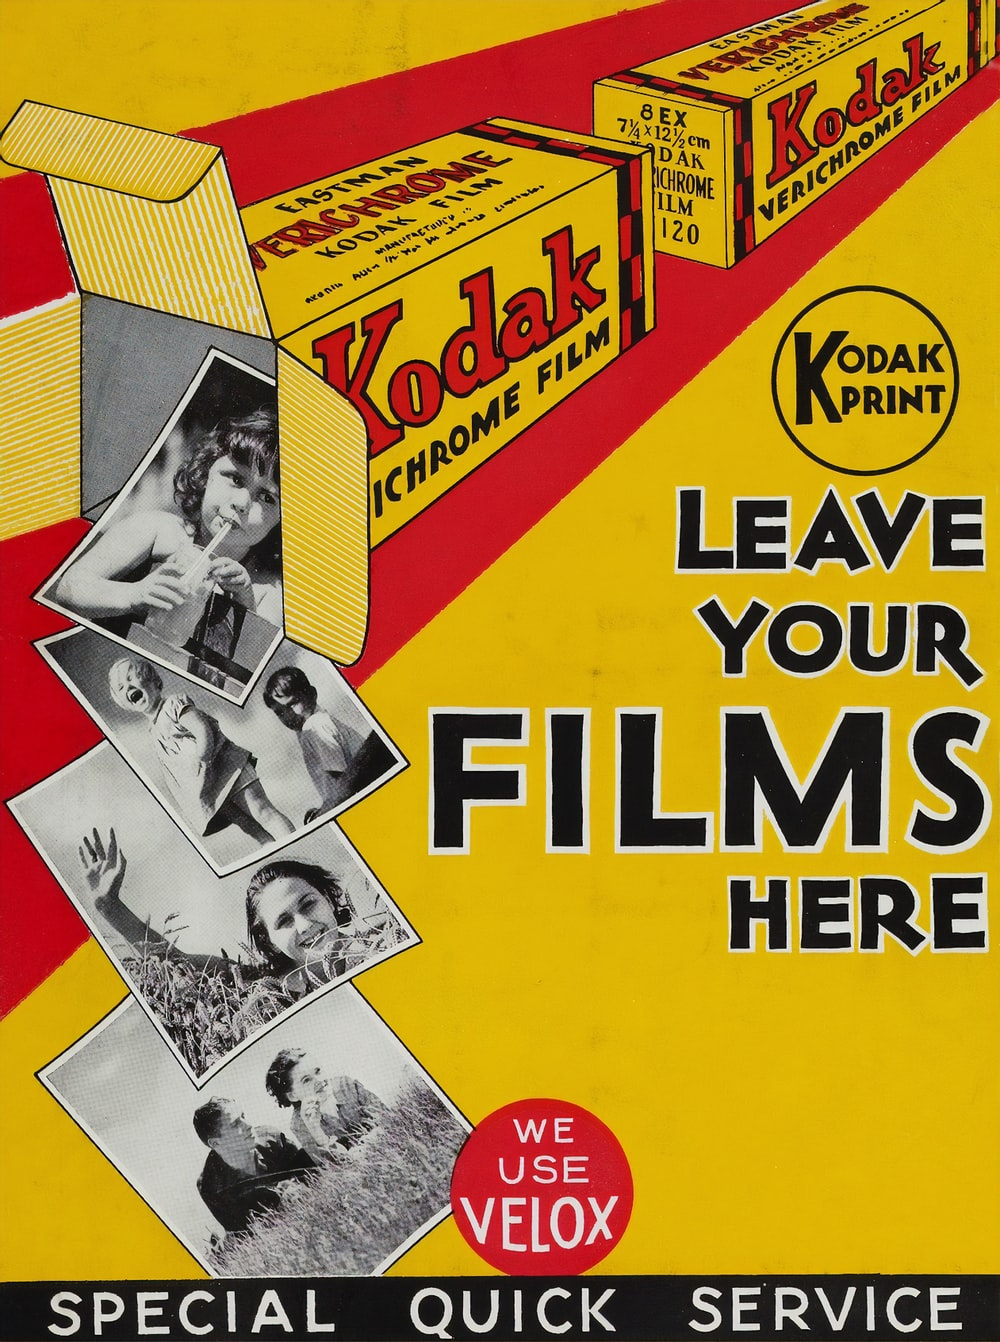 Kodak films box